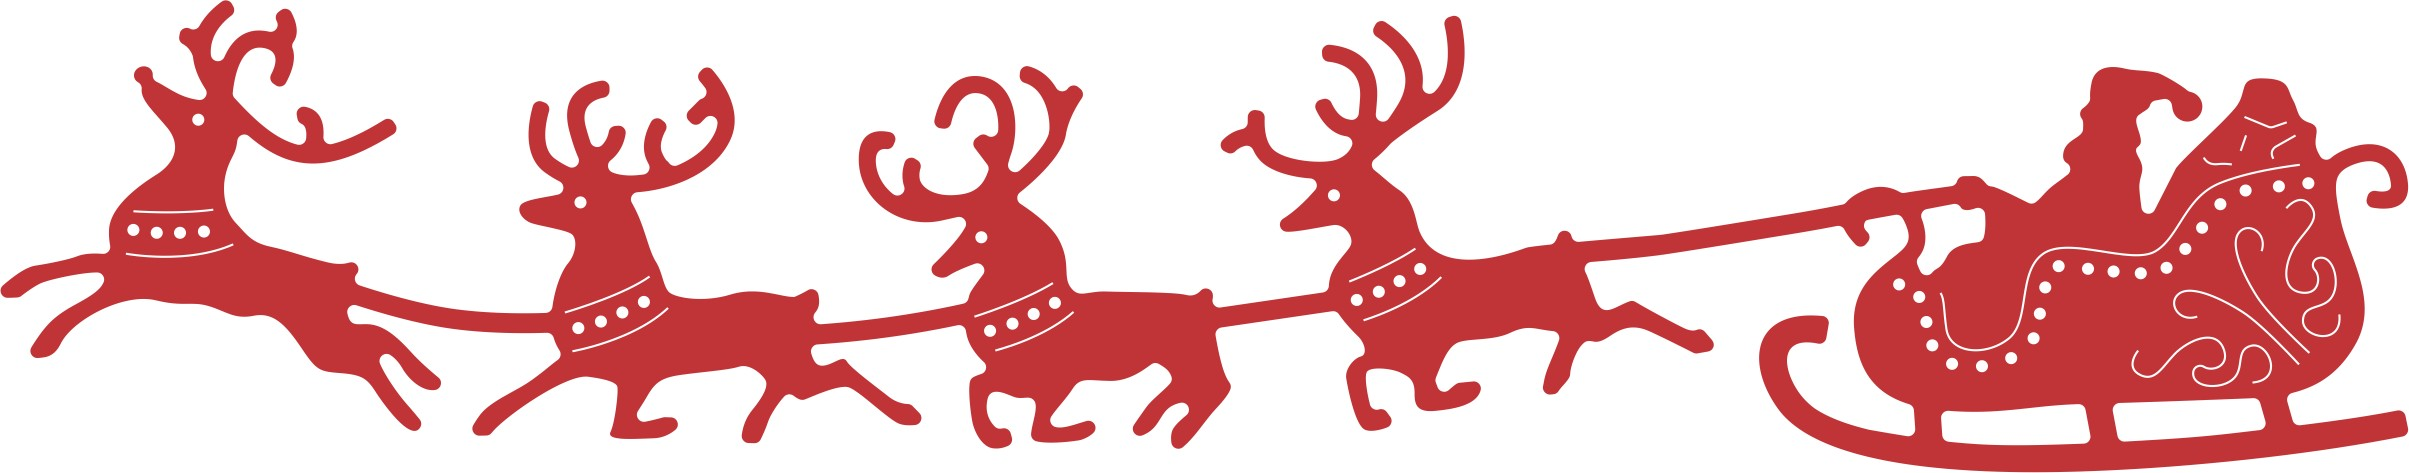 Clipart reindeer sleigh. Free santa cliparts download